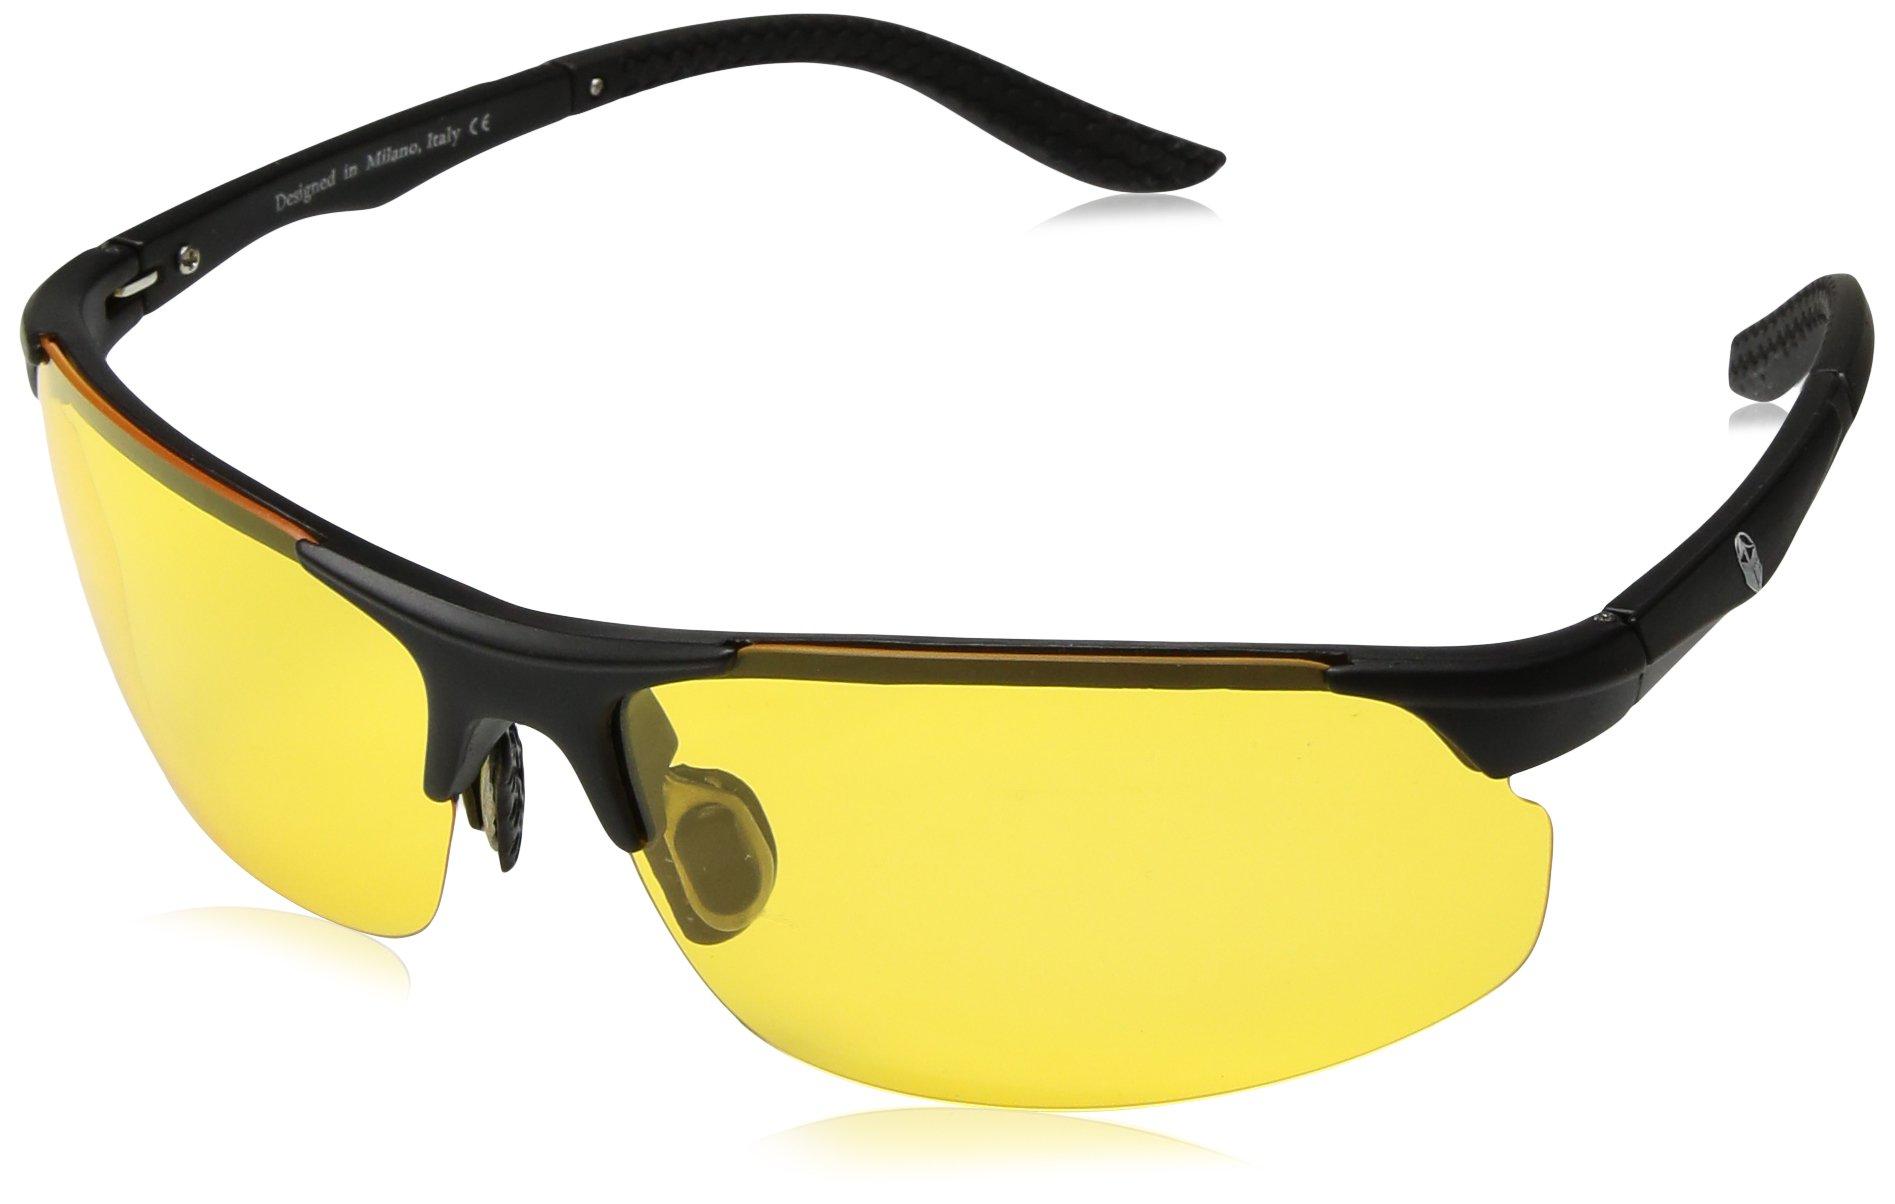 Sunglasses for Men and Women – Feirdio Retro Designer Openwork Metal Frame Men Sunglasses 575 (D07)